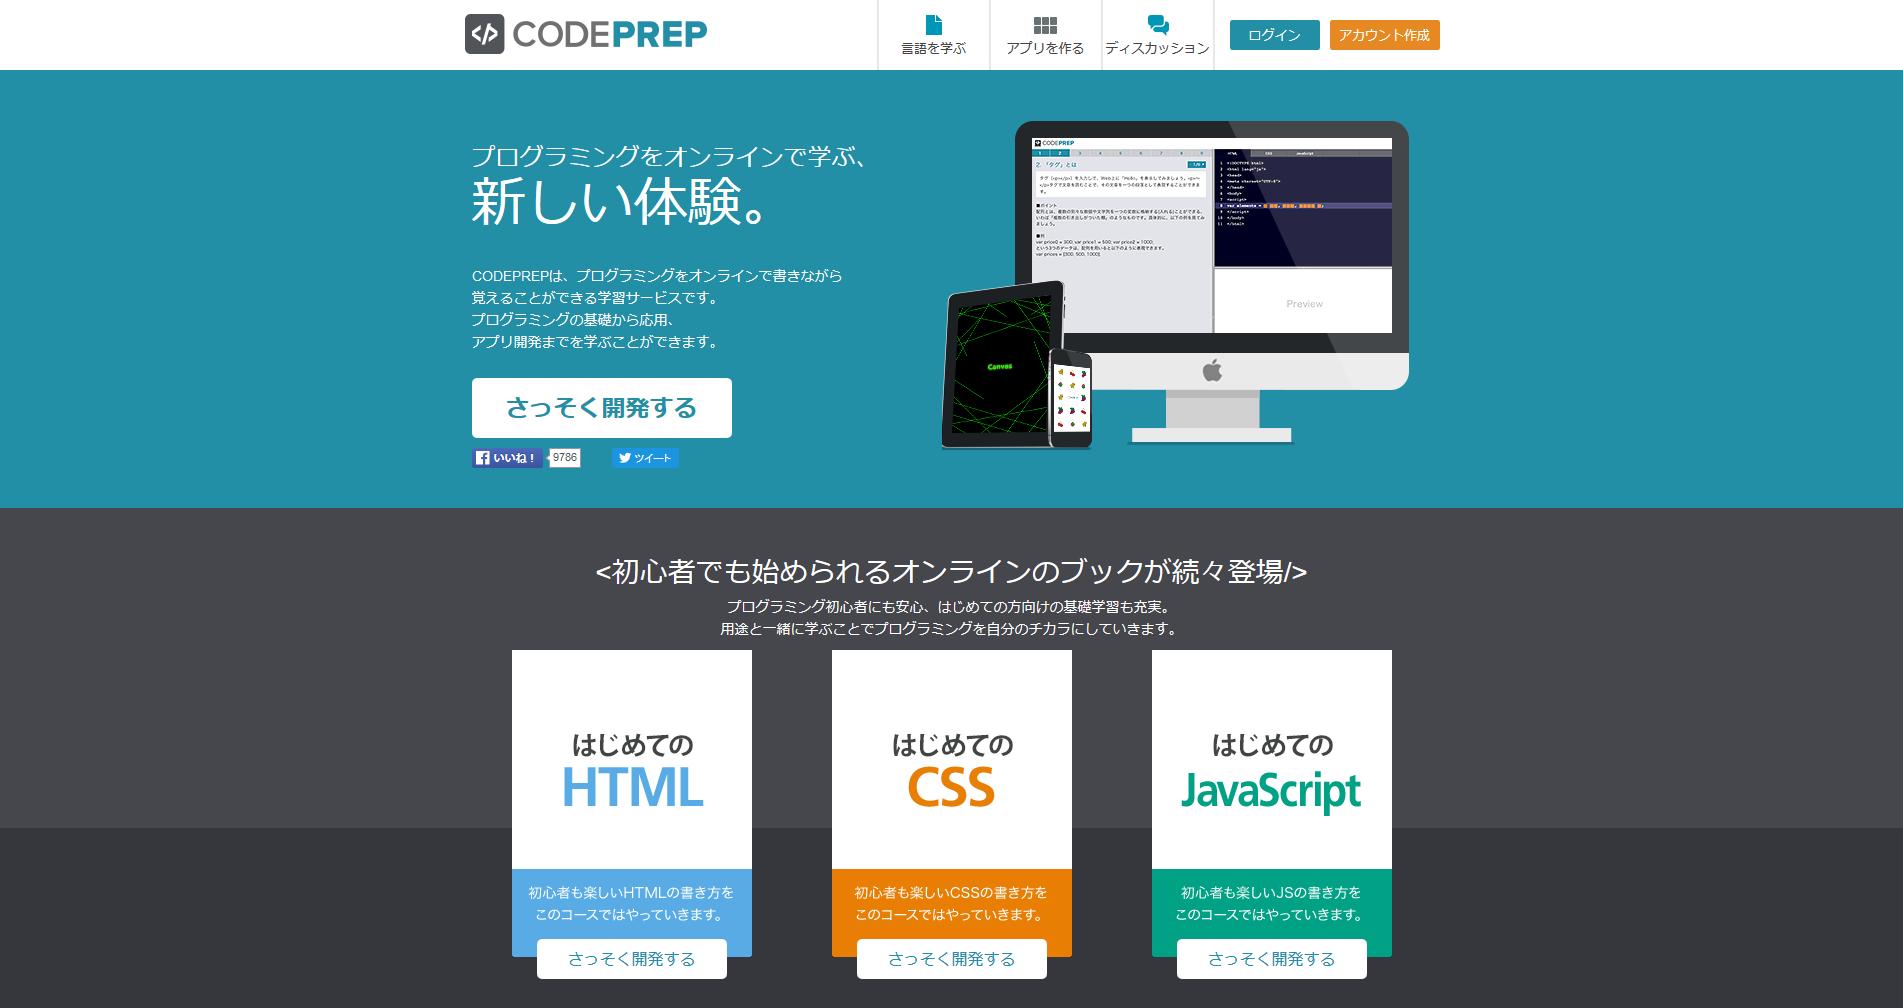 CODEPREP -オンラインでプログラミングを学ぼう-